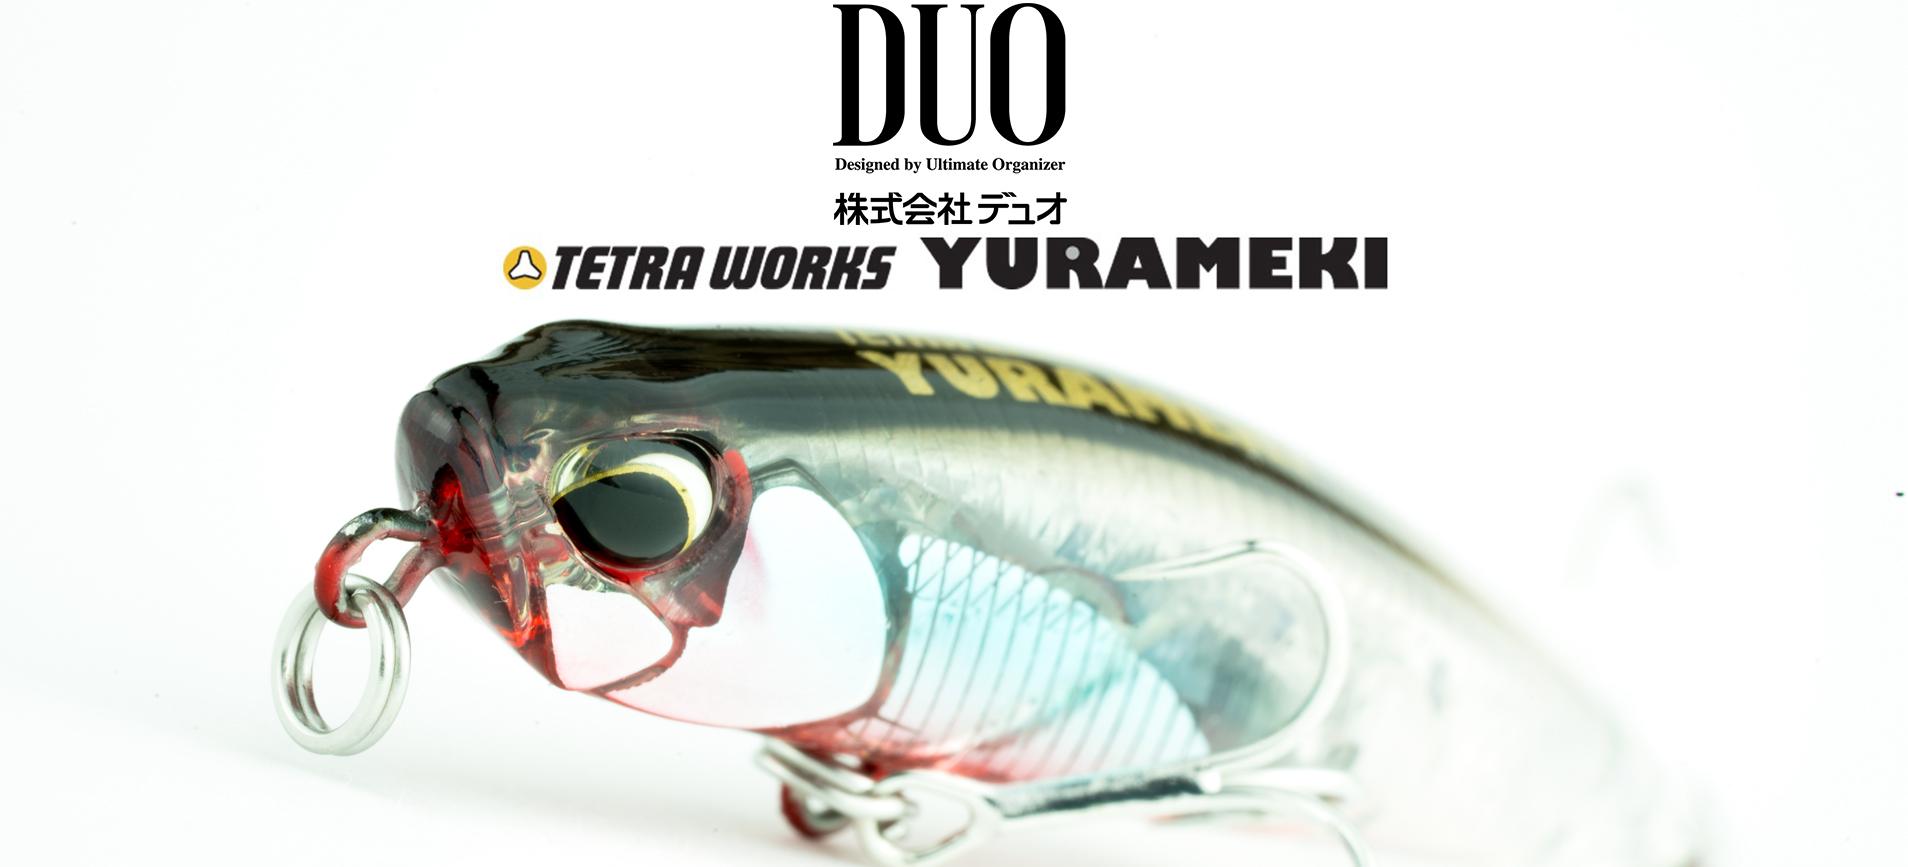 DUO Tetra Works Yurameki